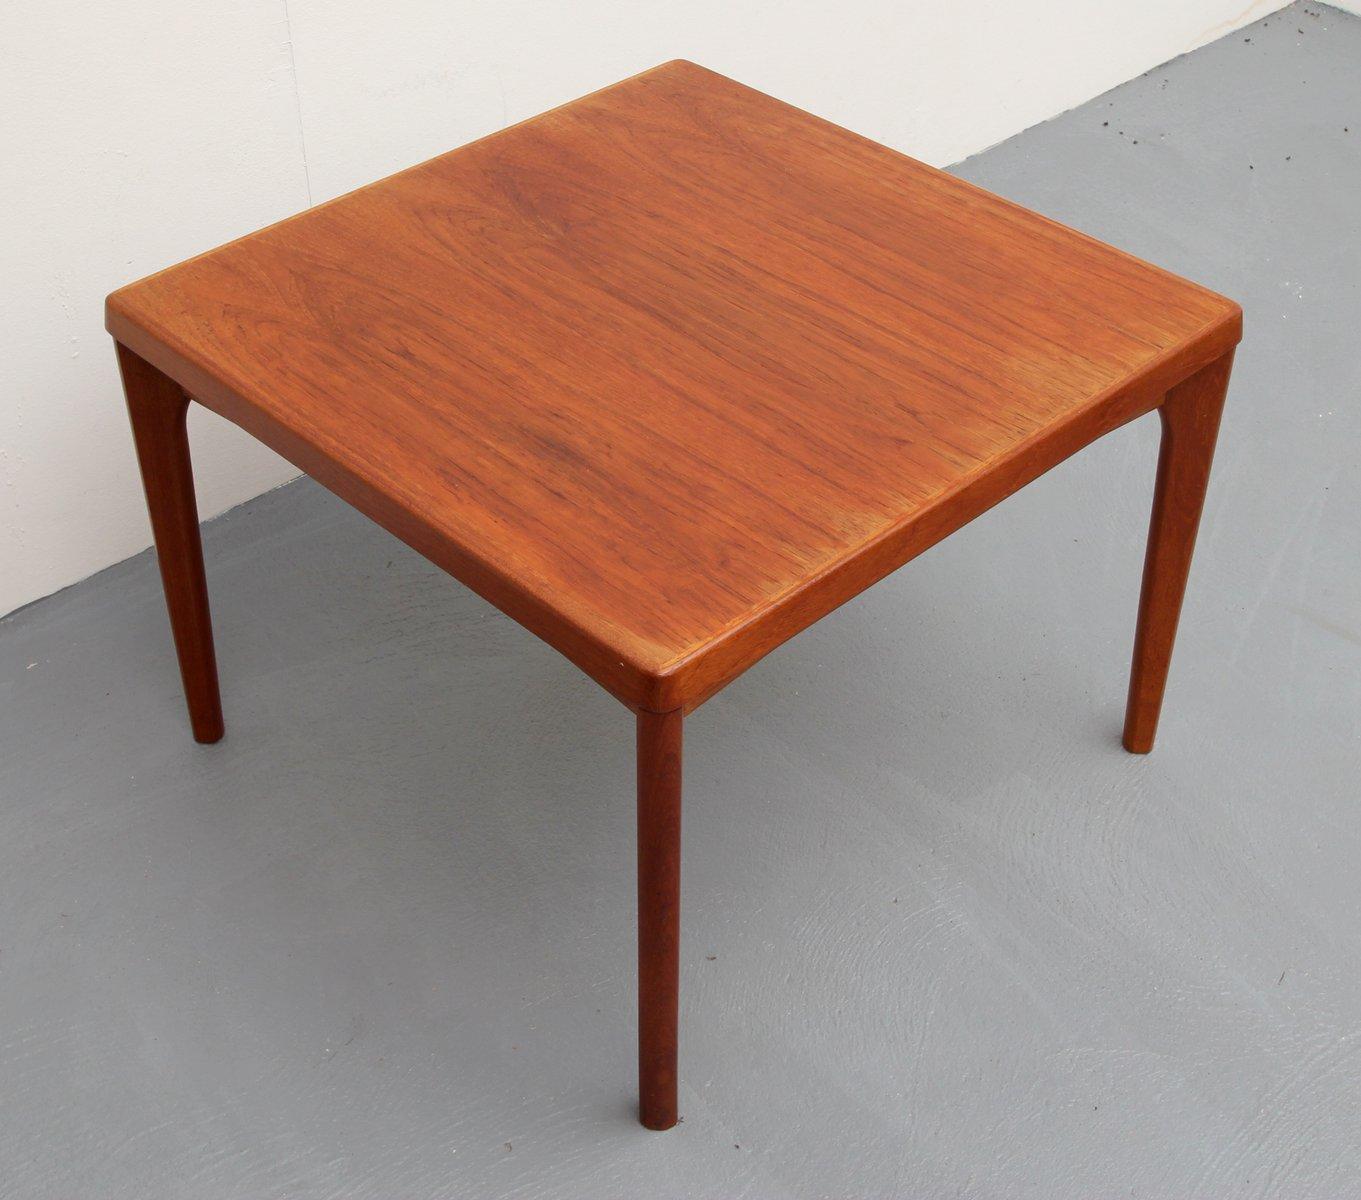 Vintage Teak Coffee Table By Henning Kjaernulf For Vejle Mobelfabrik For Sale At Pamono